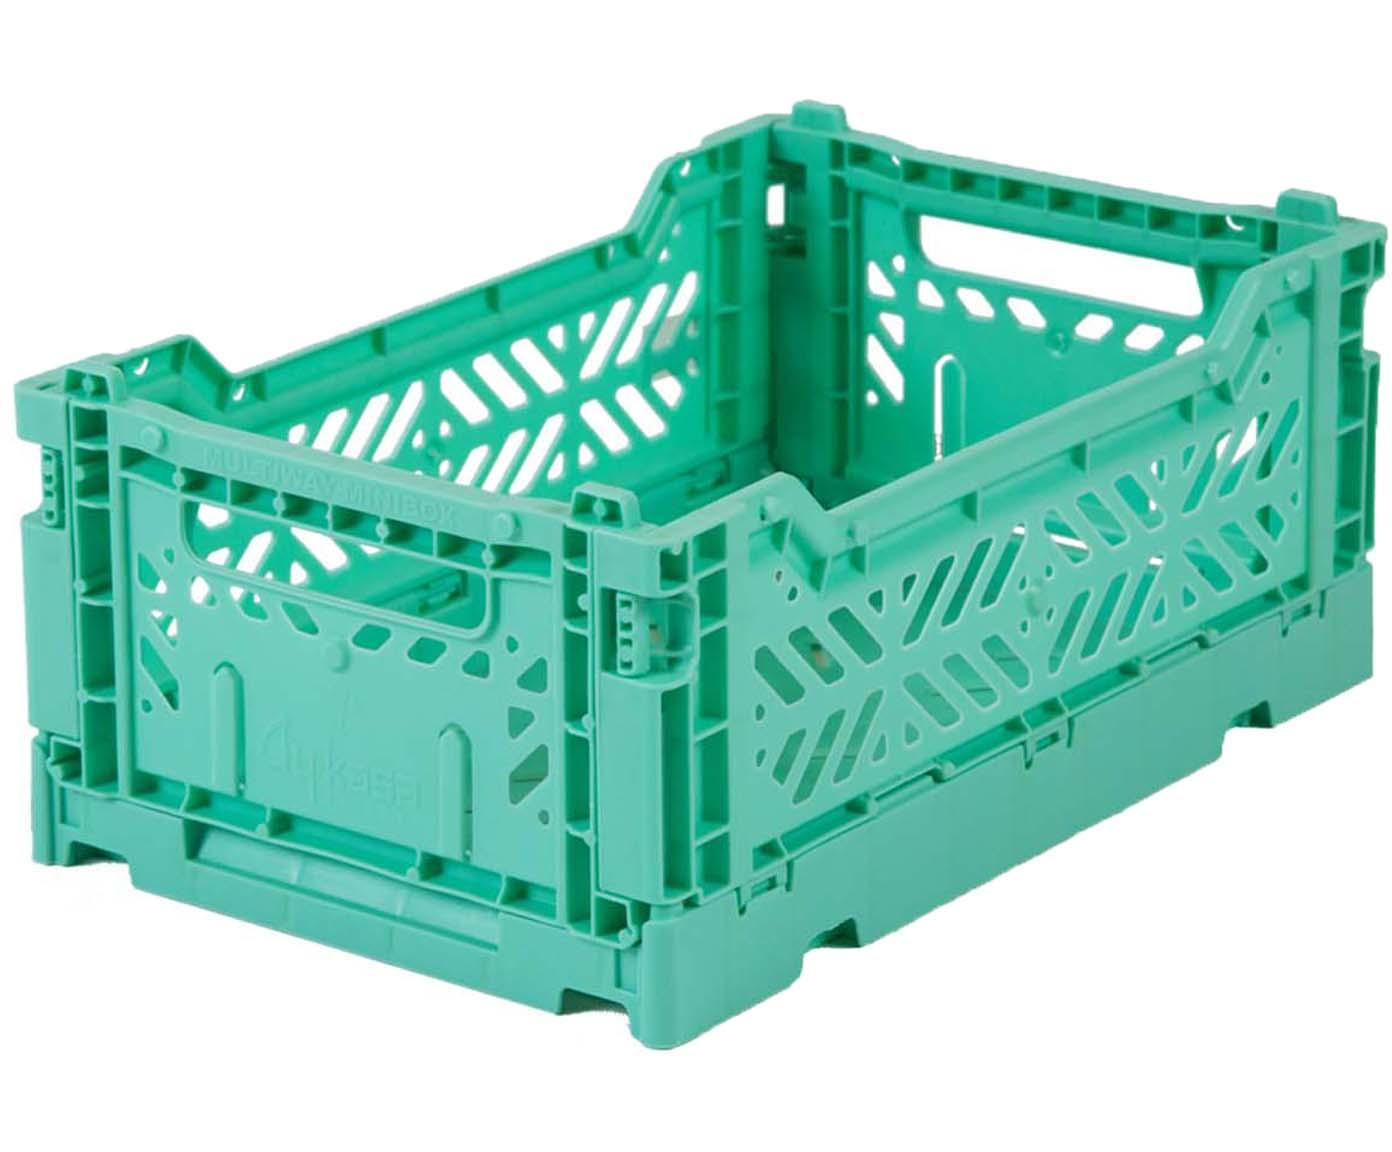 Caja pegable apilable Mint, pequeña, Plástico reciclado, Verde menta, An 27 x Al 11 cm